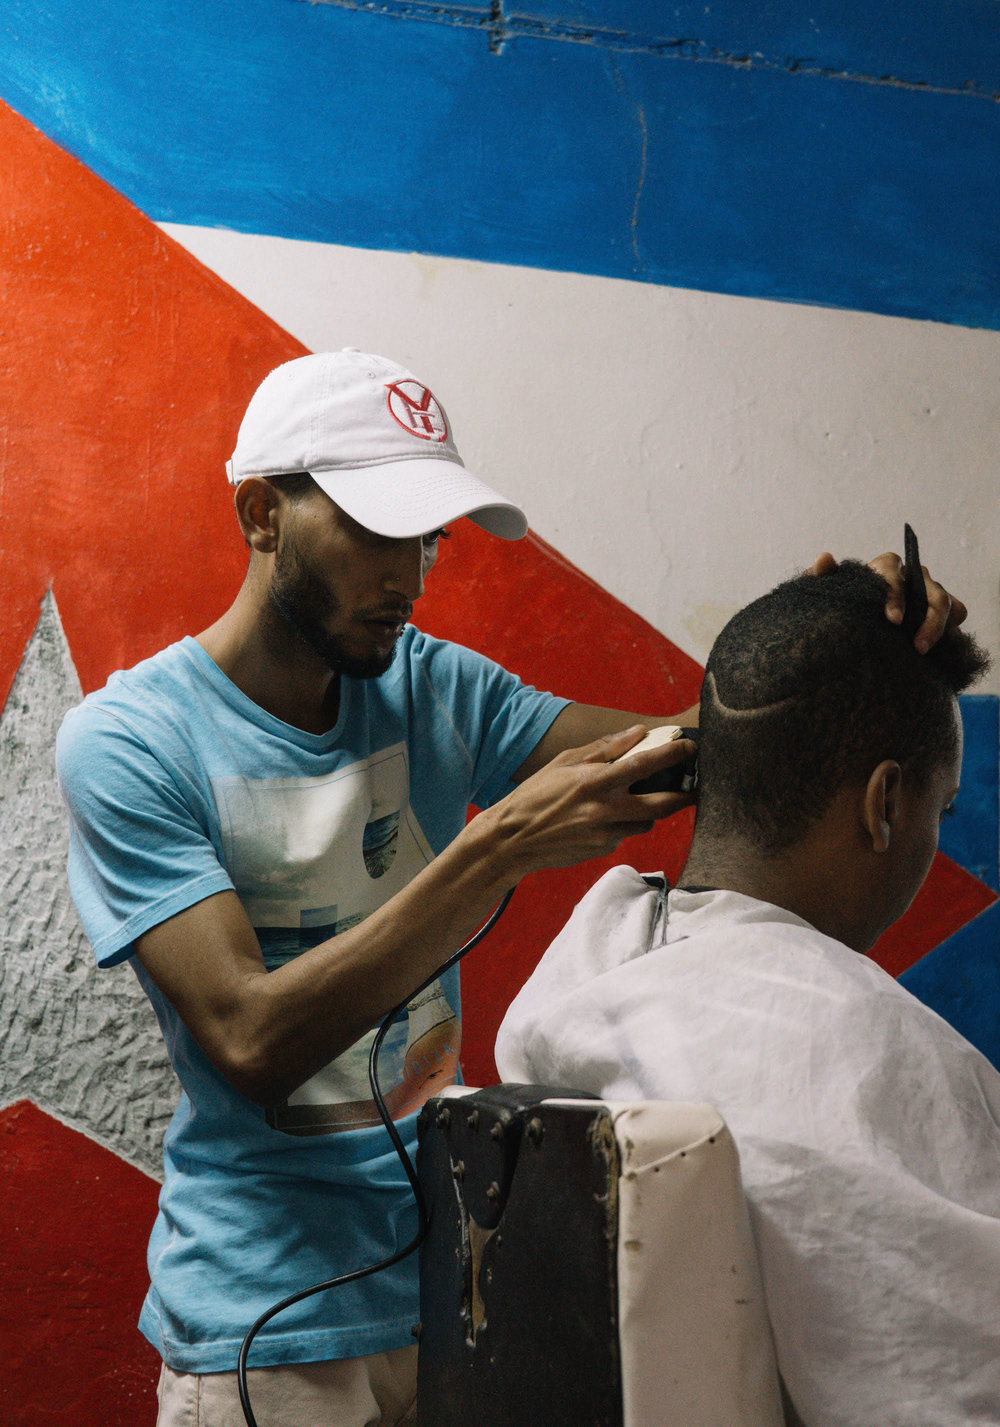 Cuba_Icantapologizeagain4.jpg